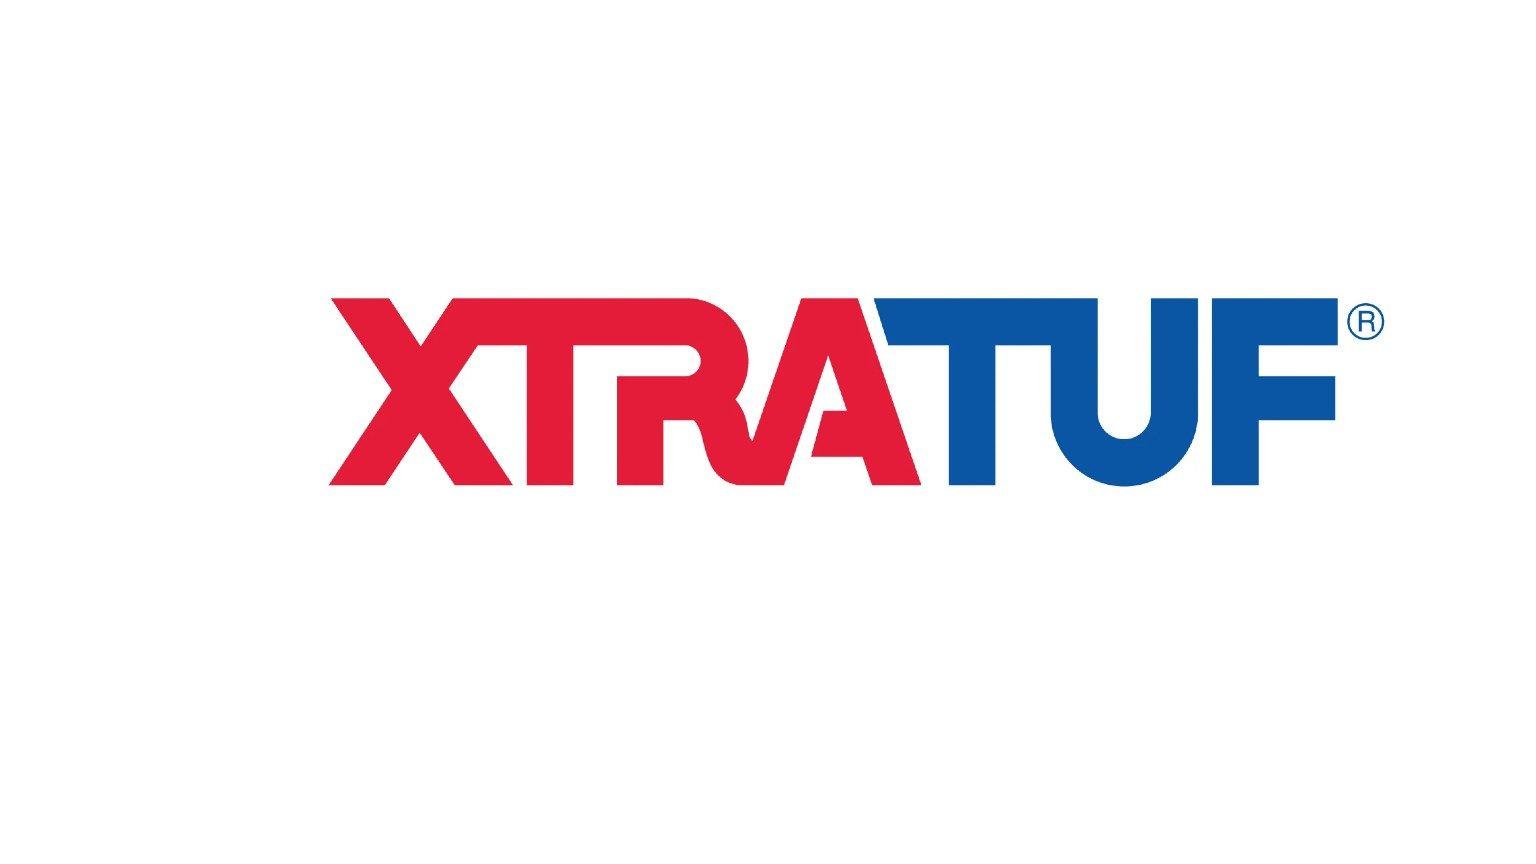 Xtratuf logo